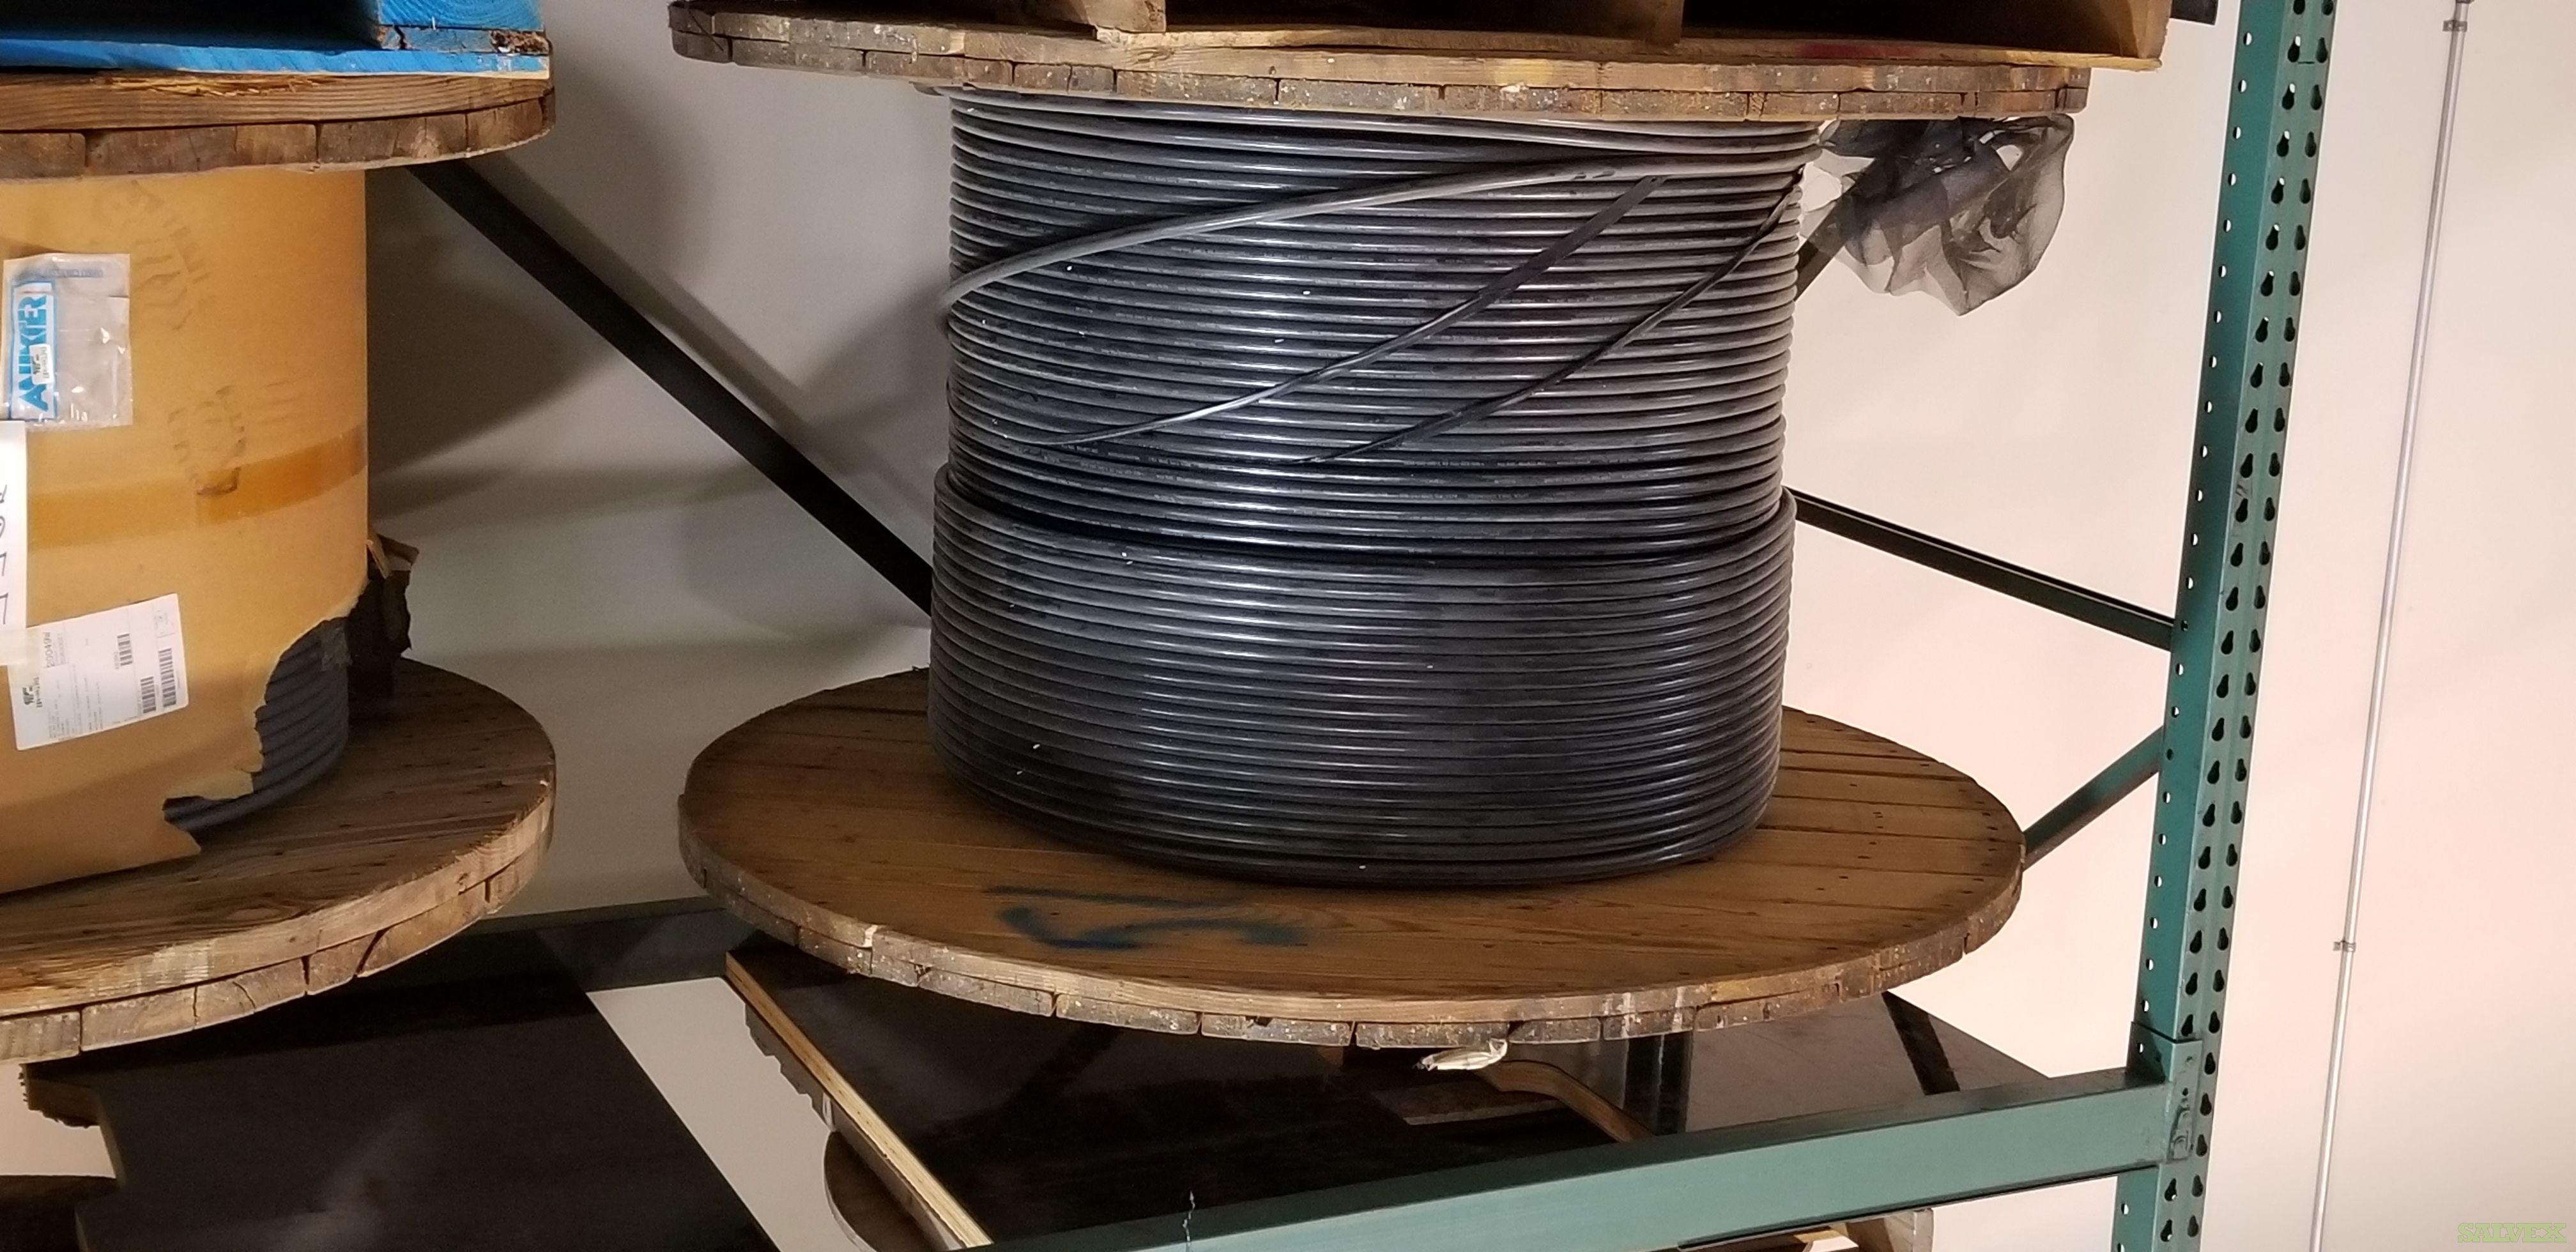 Fiber Optic Cable, Fiber Patch Cables, LC Connectors and Building Termination Materials (100,448 Ft)